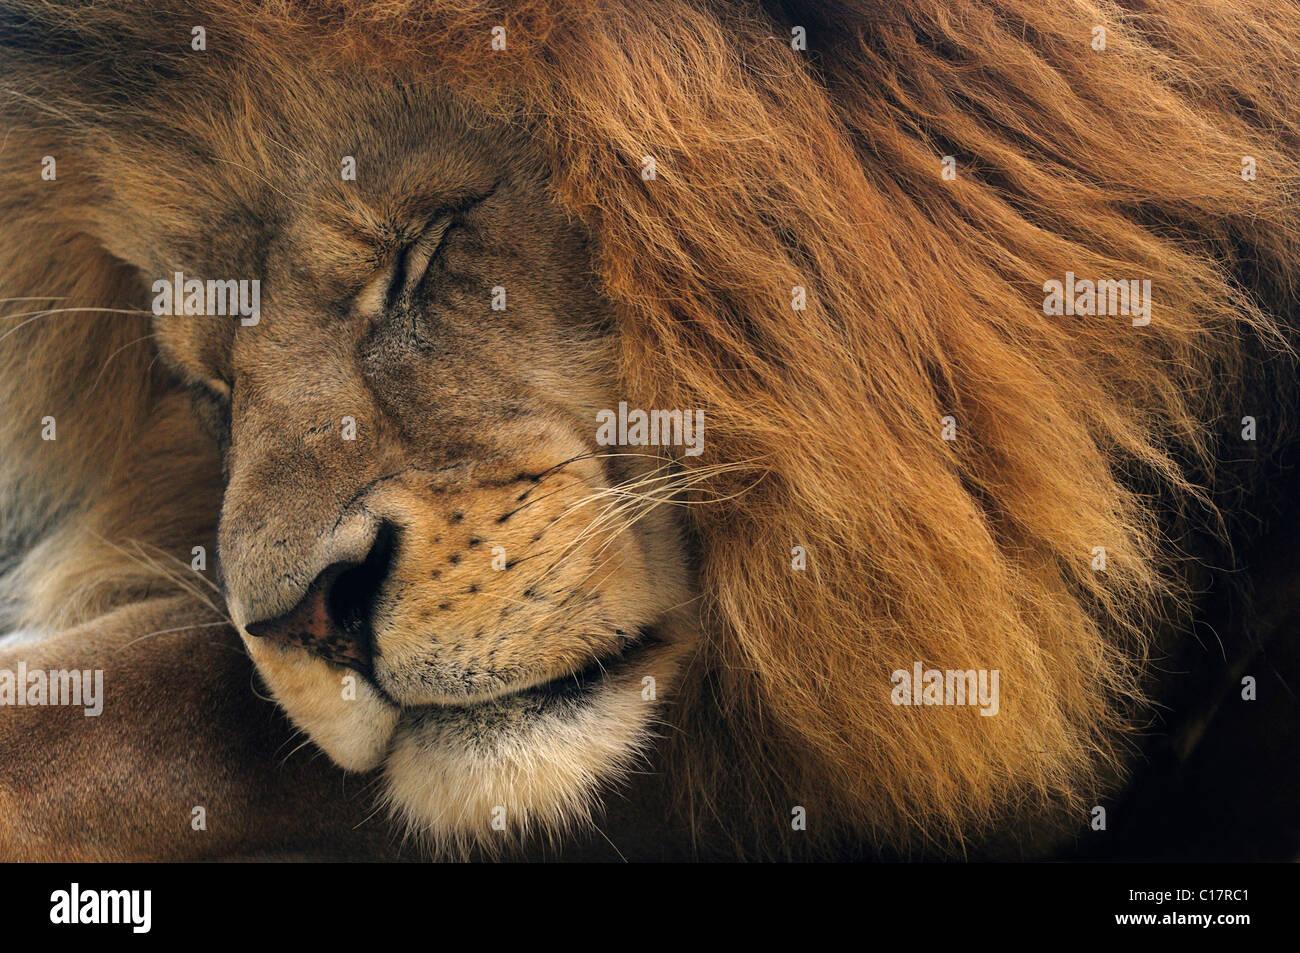 Asiatic Lion (Panthera leo persica), male, portrait - Stock Image